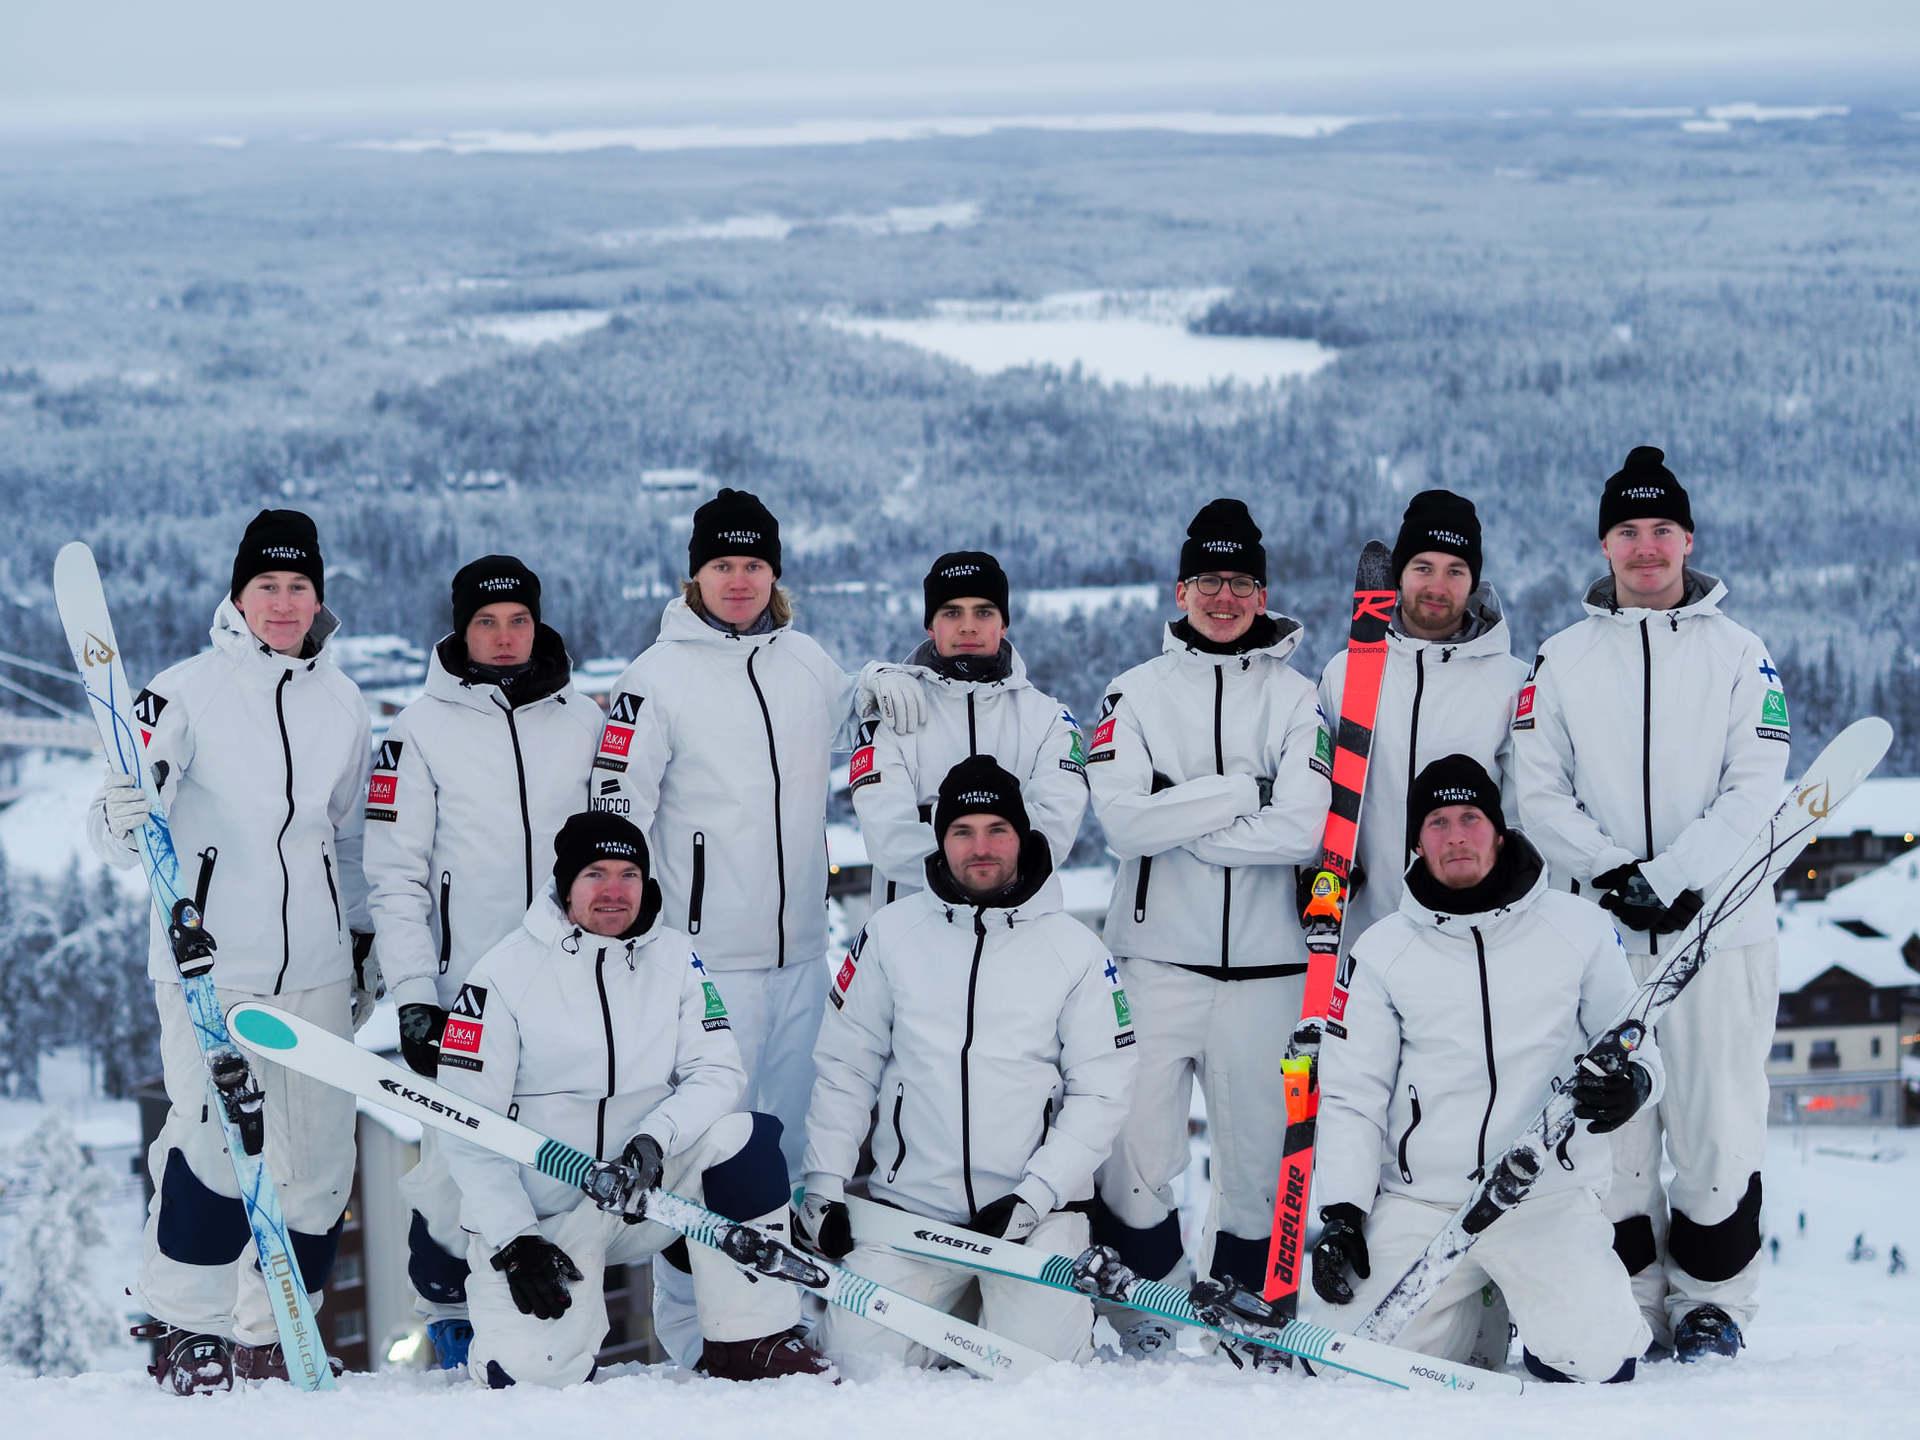 No ski imitations and no training stops